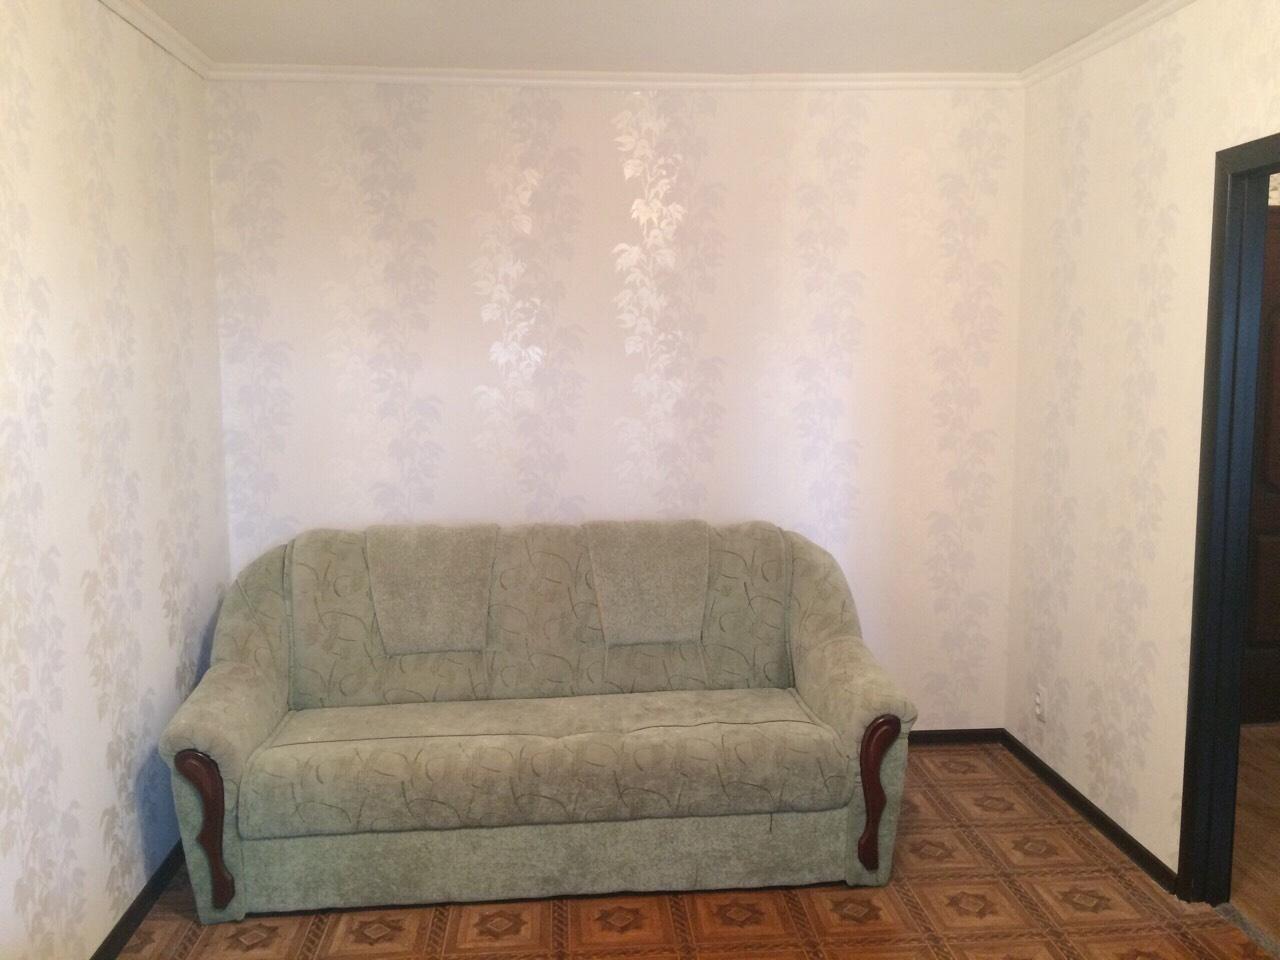 Продается 1-комнатная Квартира на ул. Инглези (25 Чапаевской Див.) — 29 900 у.е. (фото №2)